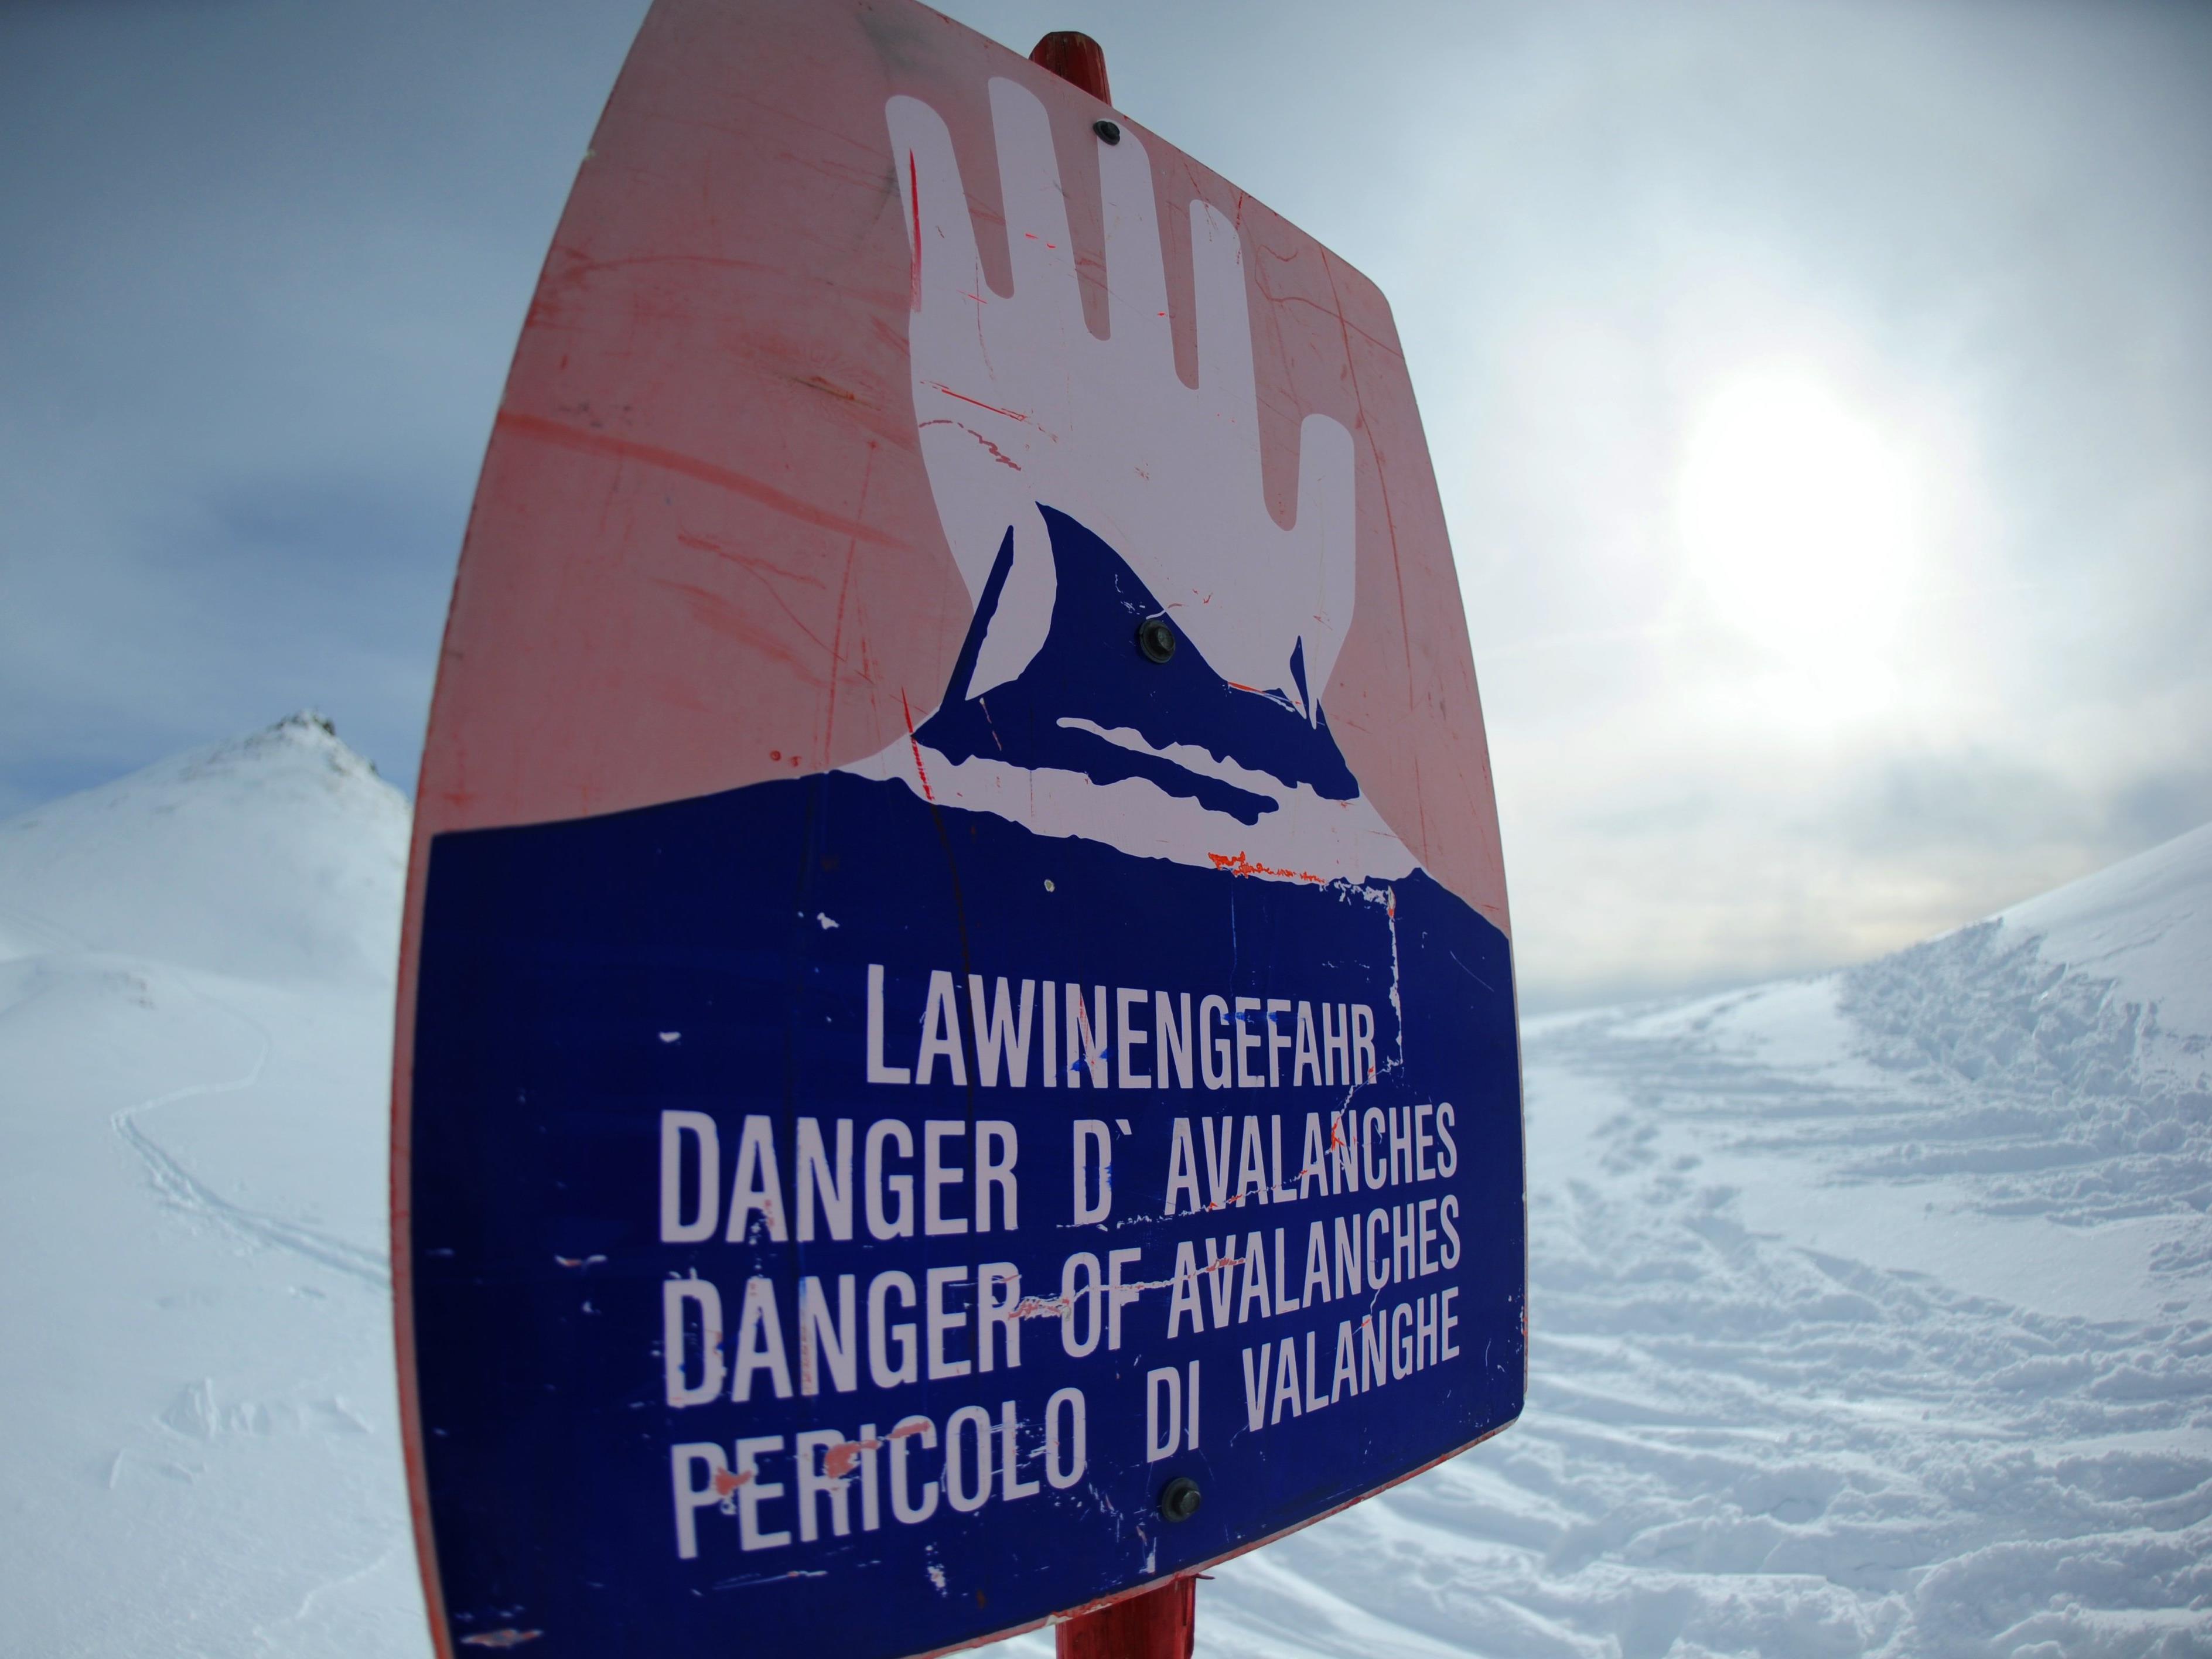 27-jähriger Skitourengeher bei Lawinenabgang in Vorarlberg getötet.